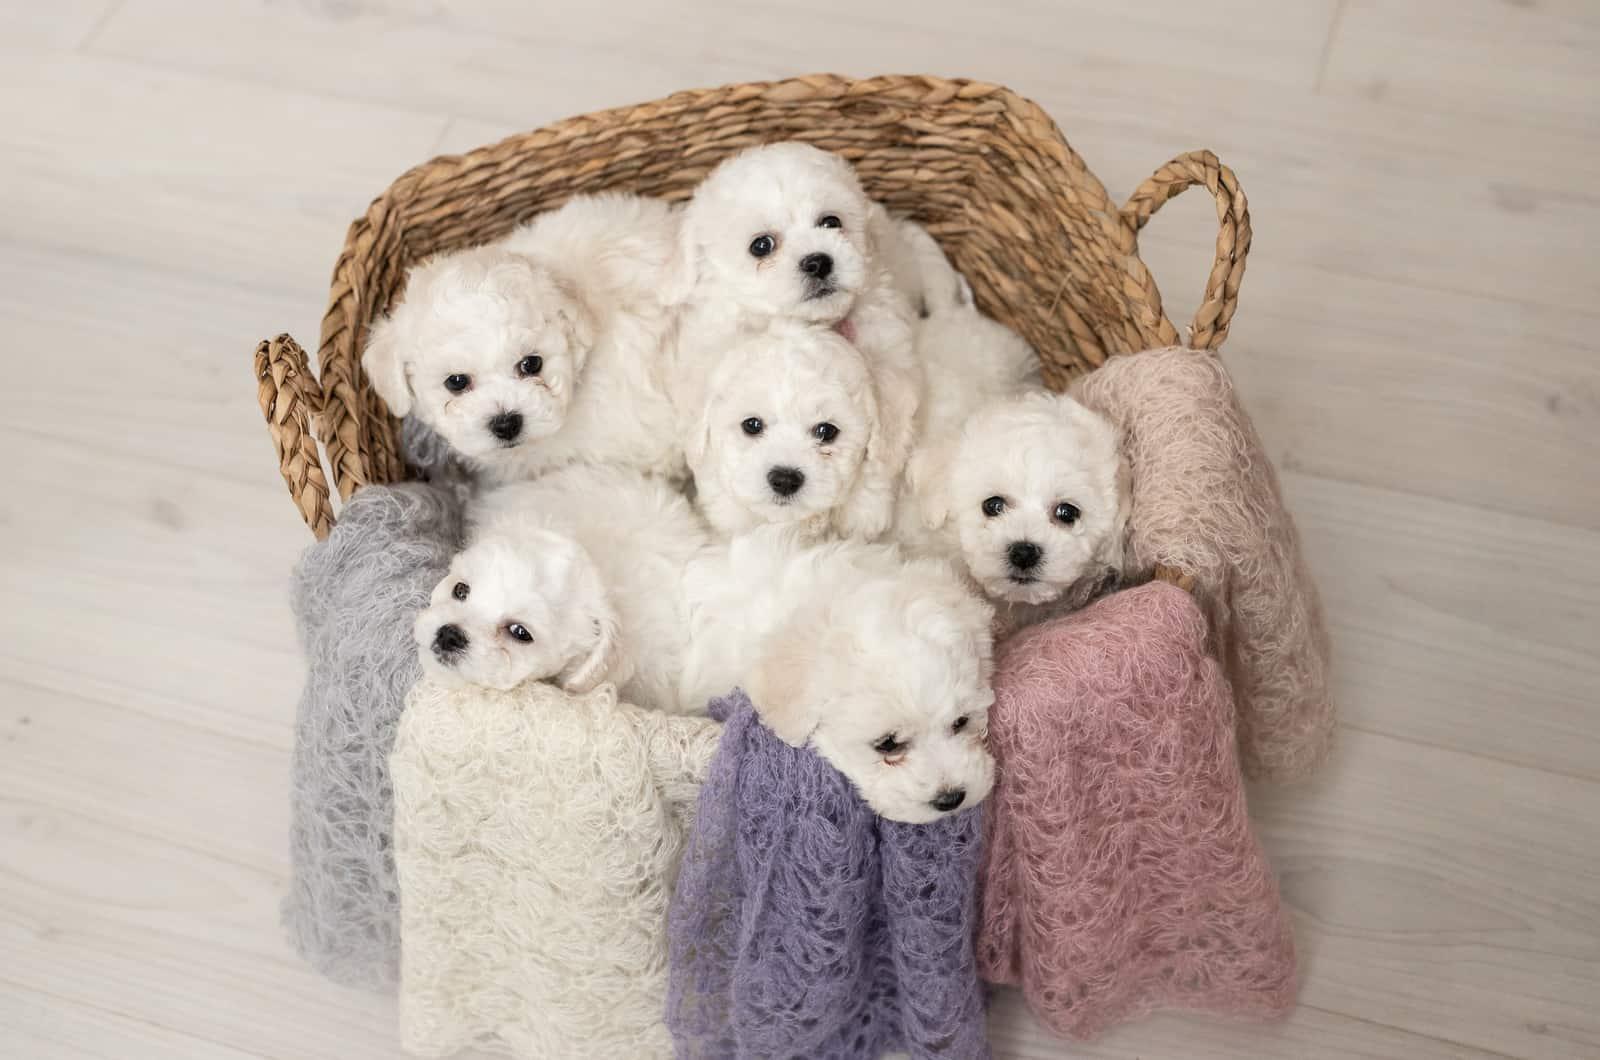 bichon frise puppies in a basket